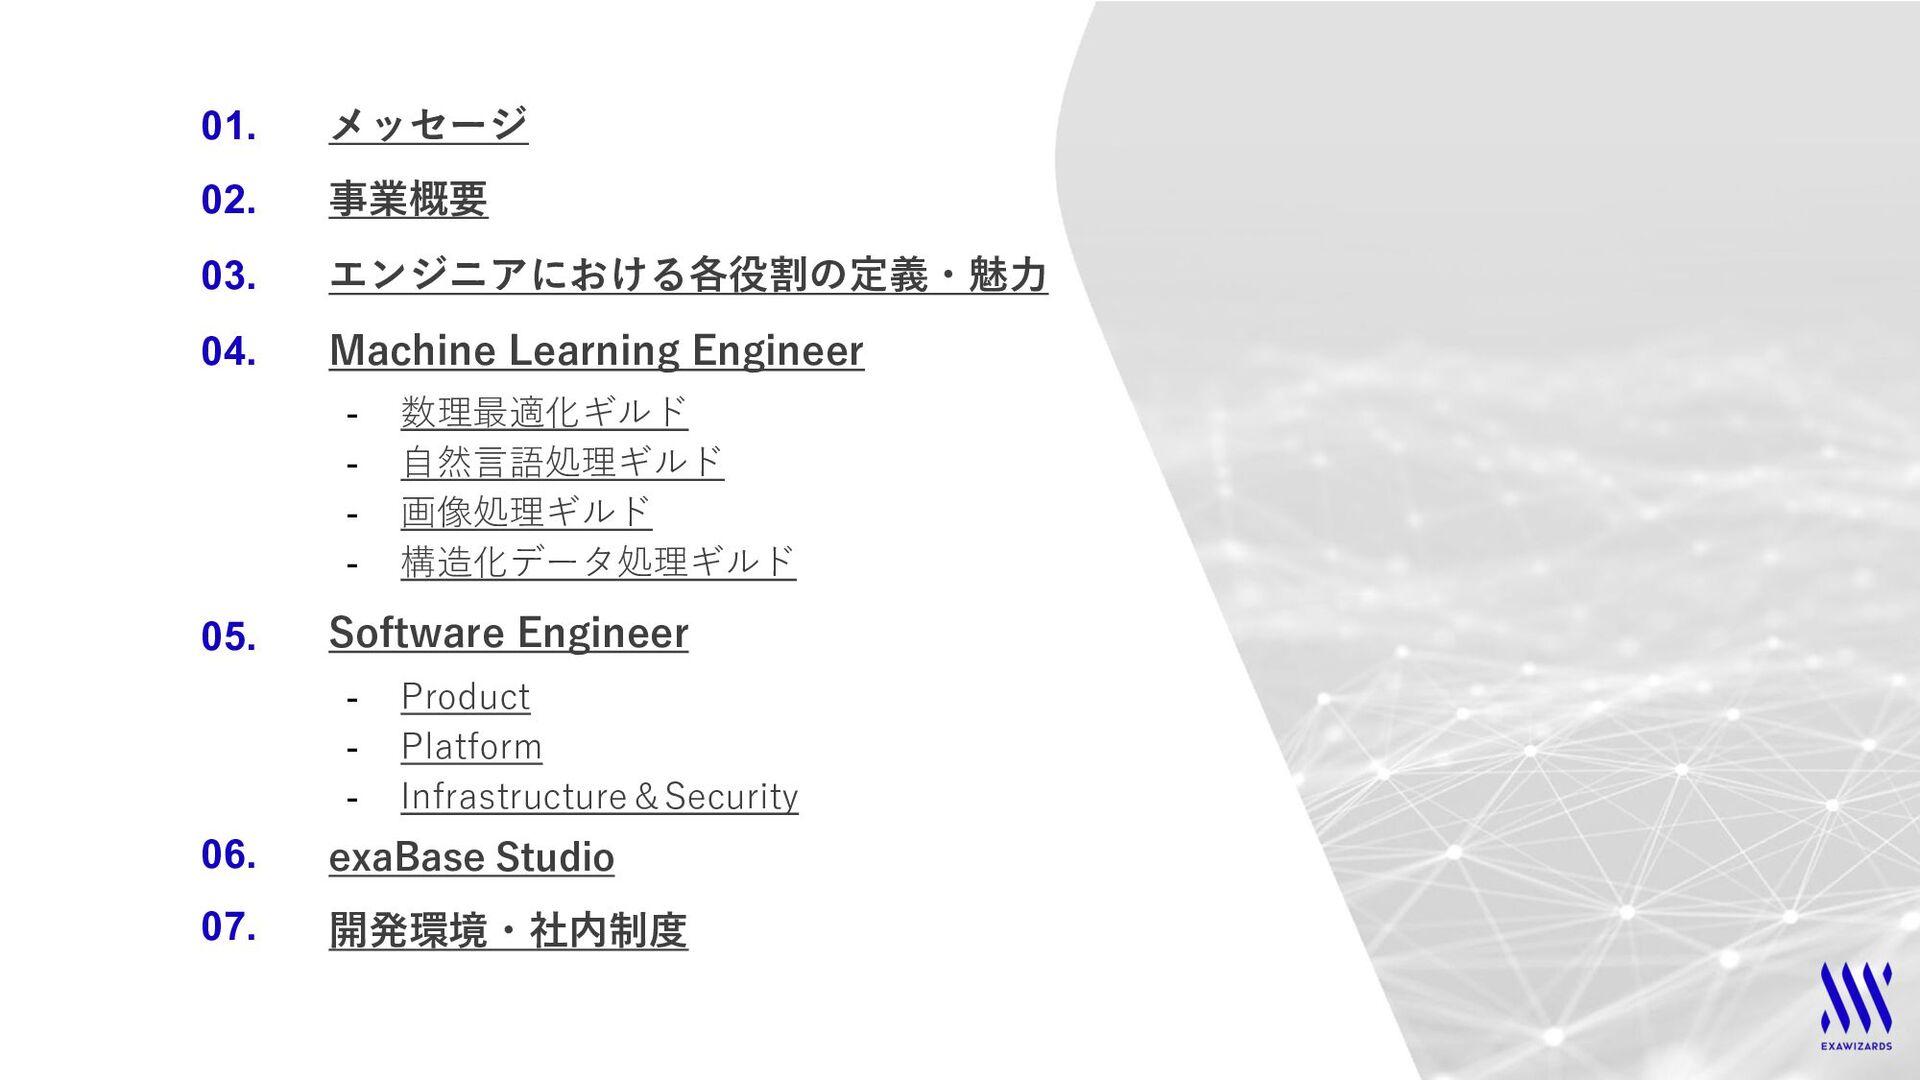 KEY MESSAGE 世界中のウィザード達が 人工知能で社会課題を解決する場 日本が先行して...